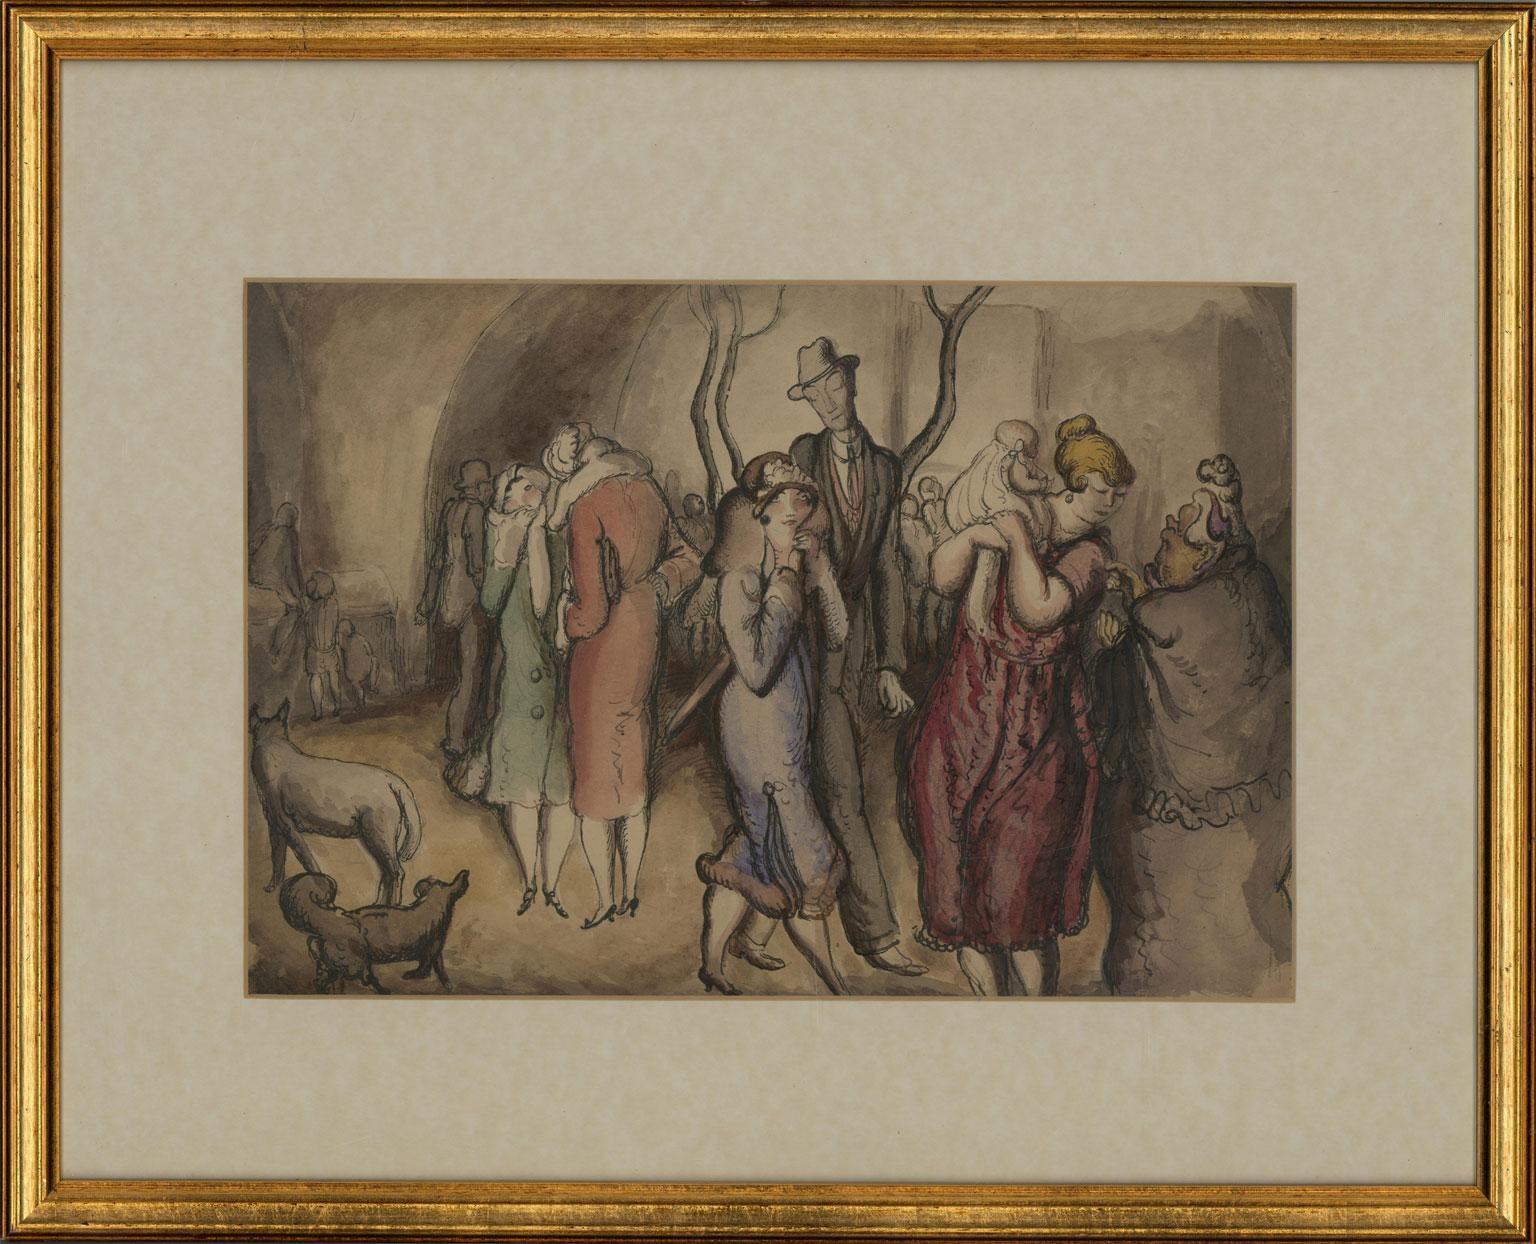 Harold Hope Read (1881-1959) - Framed Pen and Ink Drawing, Society Nightlife